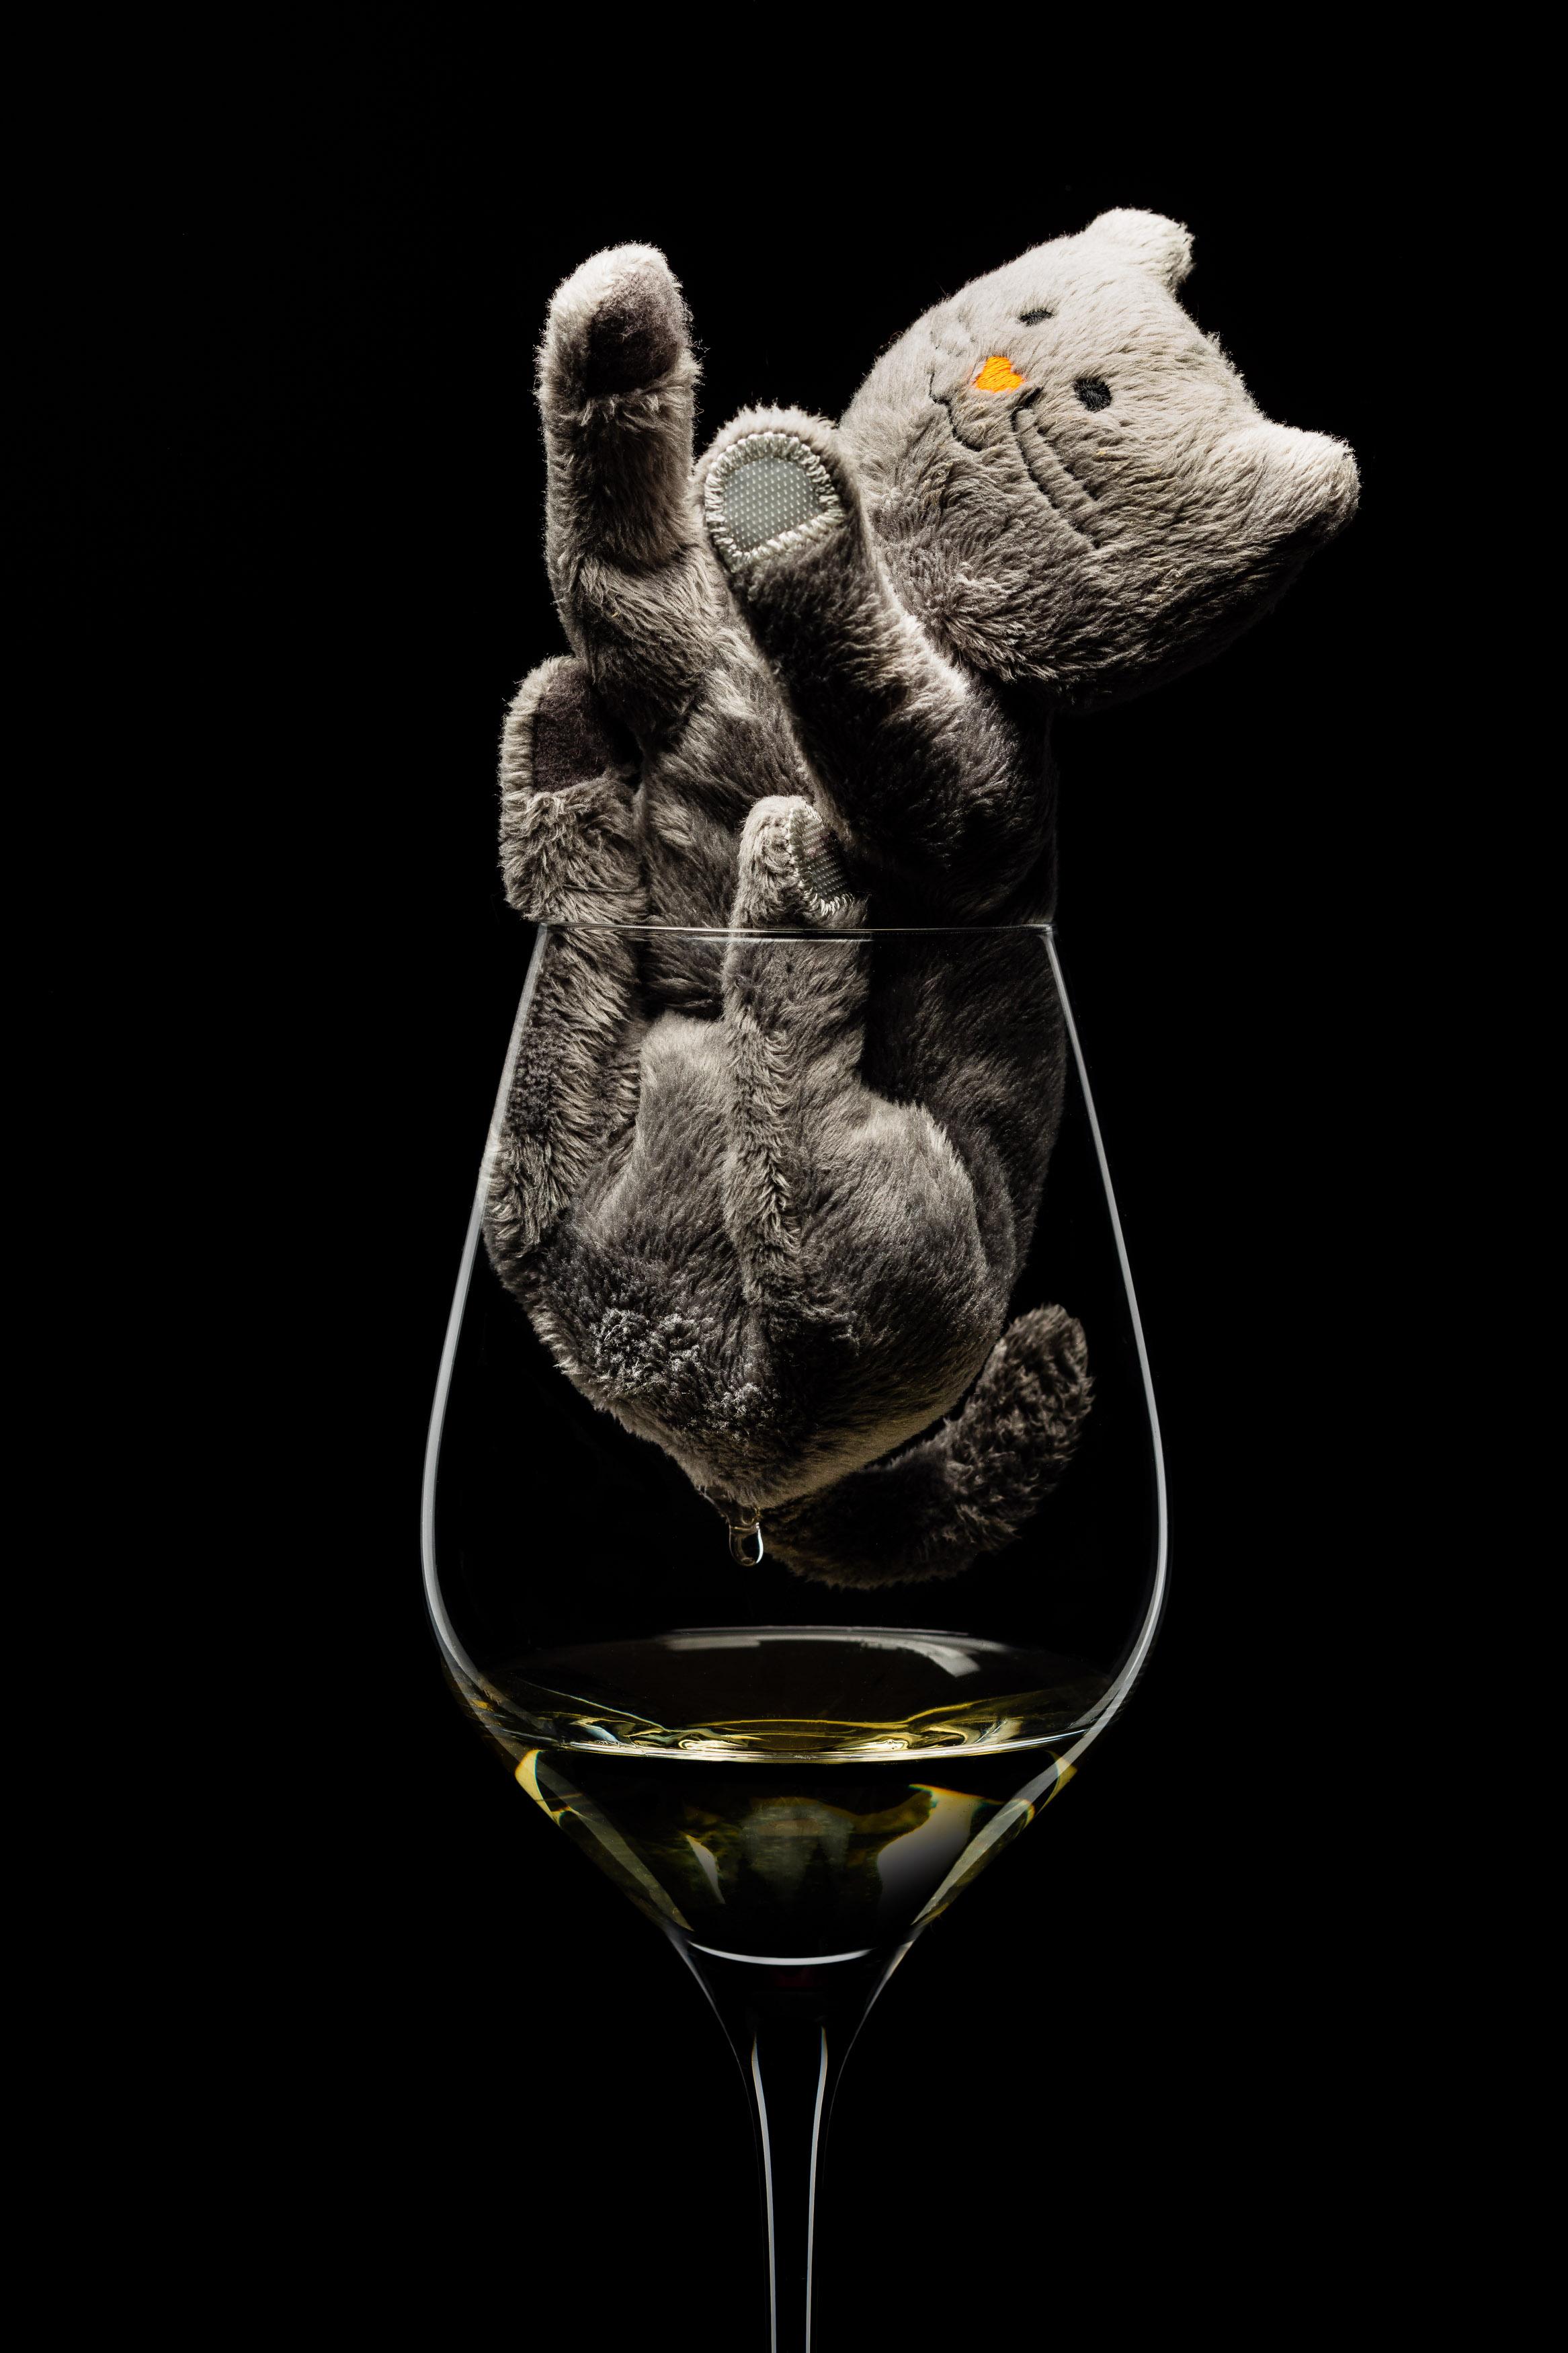 Crashkurs Wein 27: Sauvignon blanc